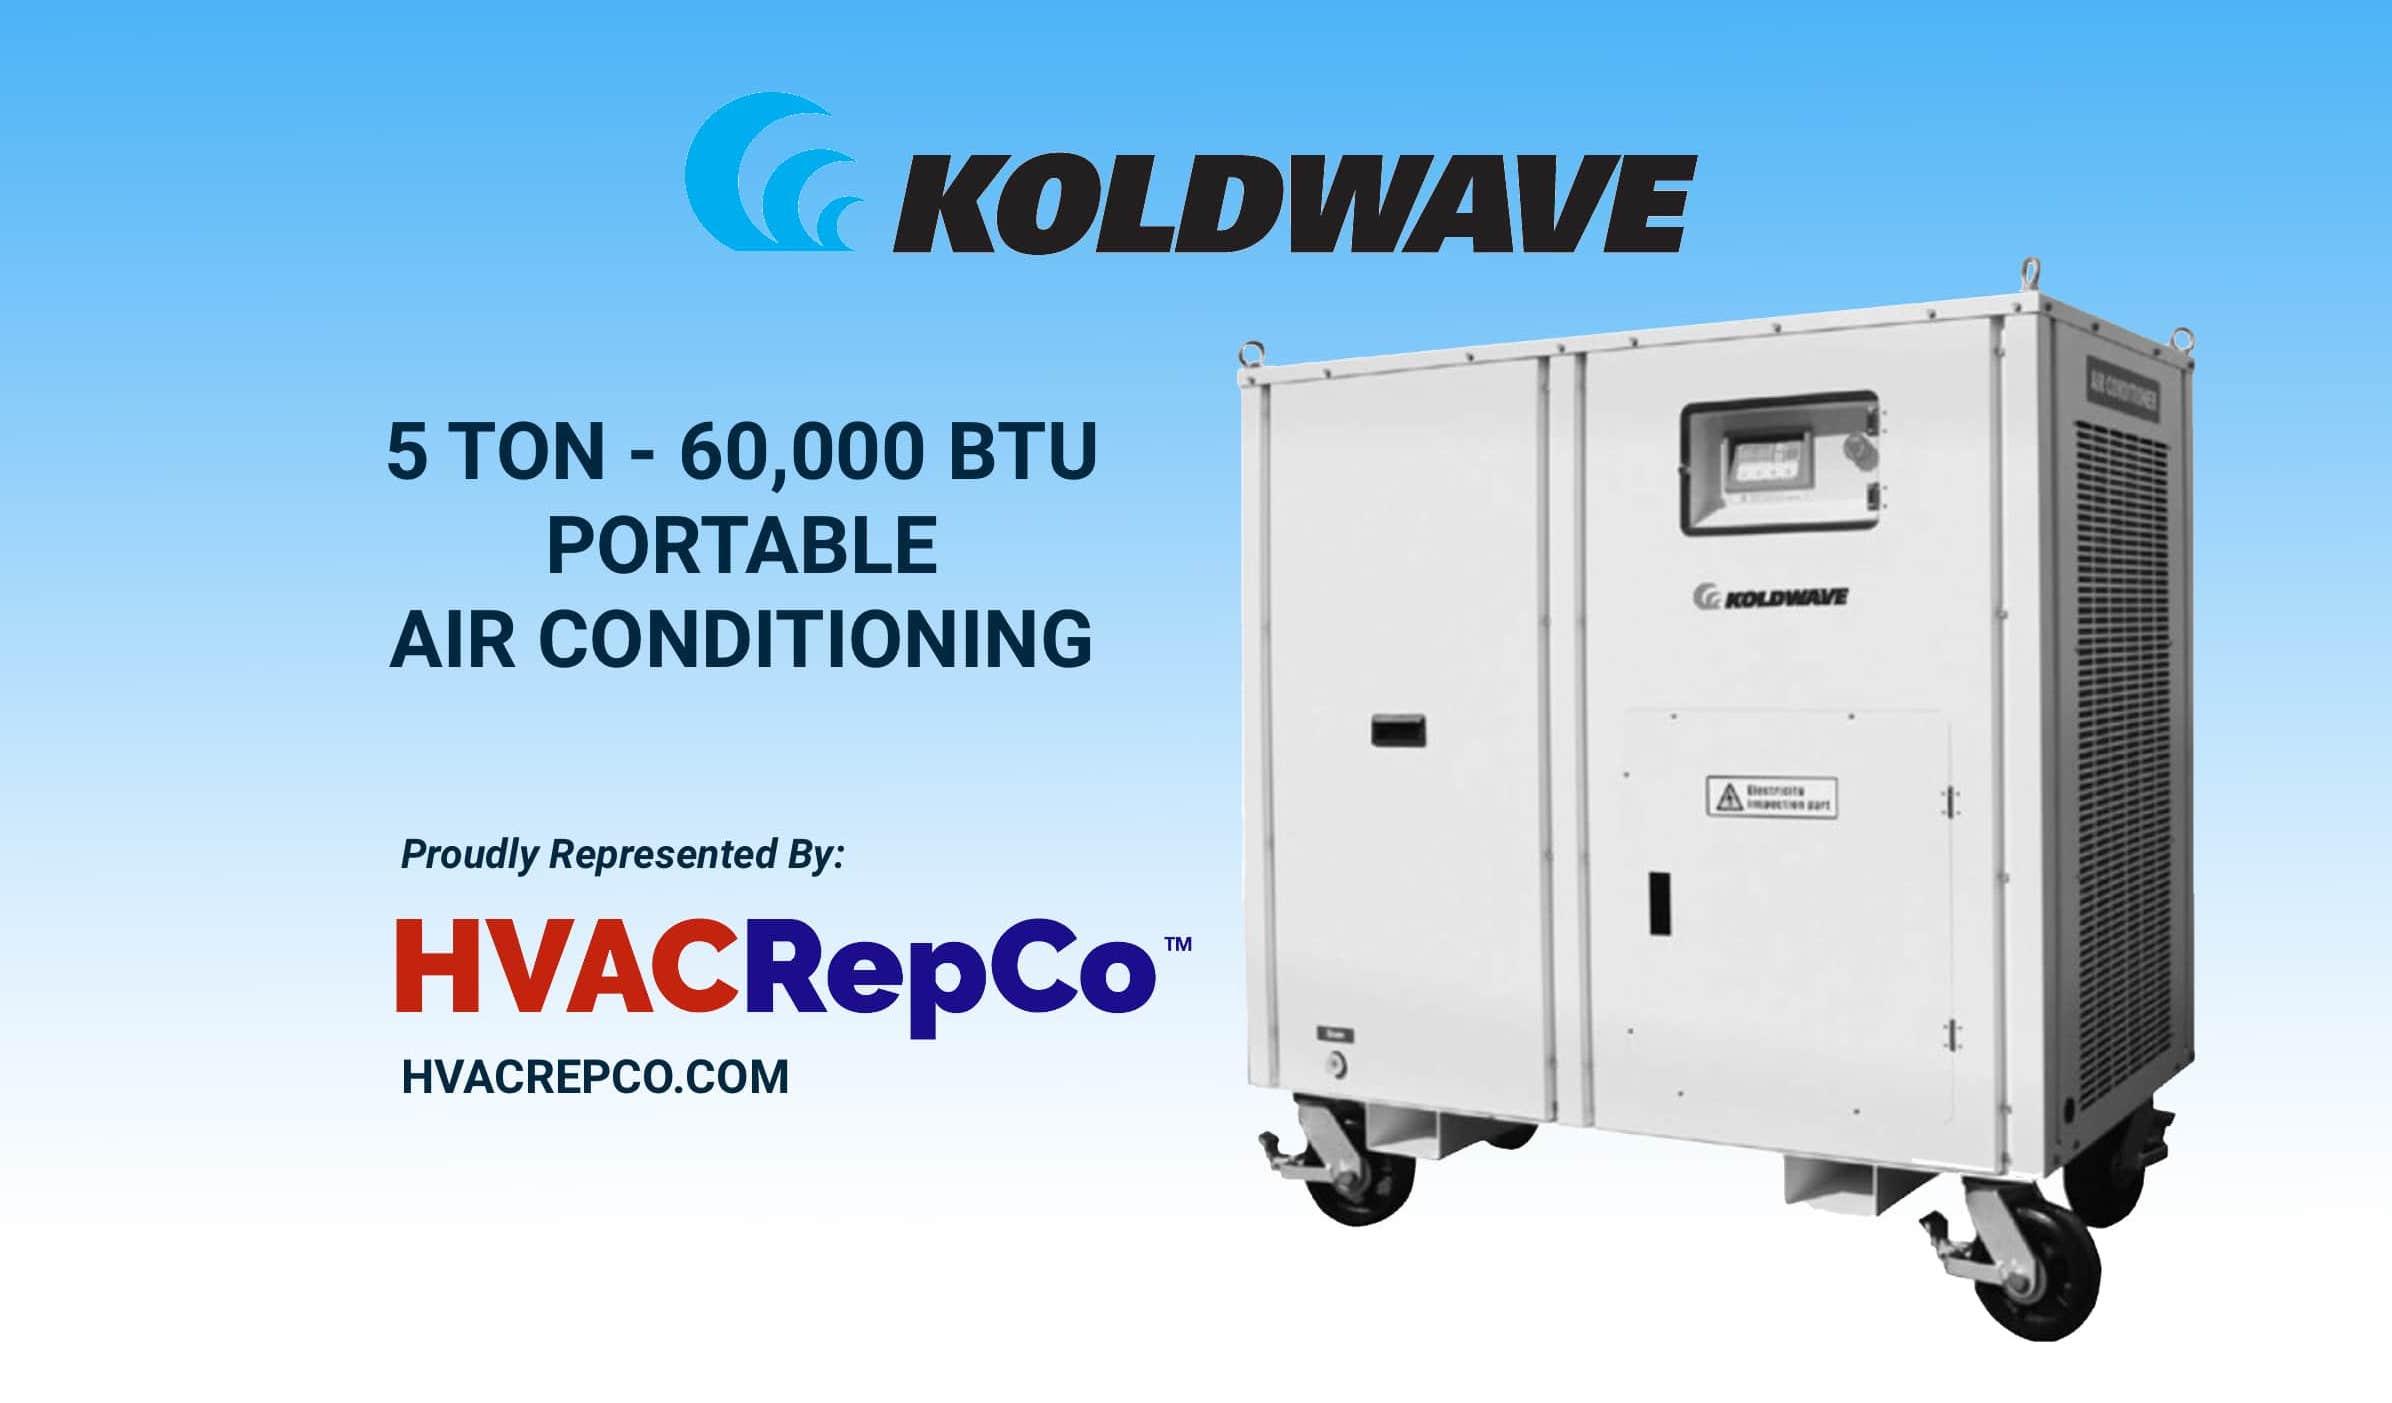 5 Ton Portable AC Unit from Koldwave